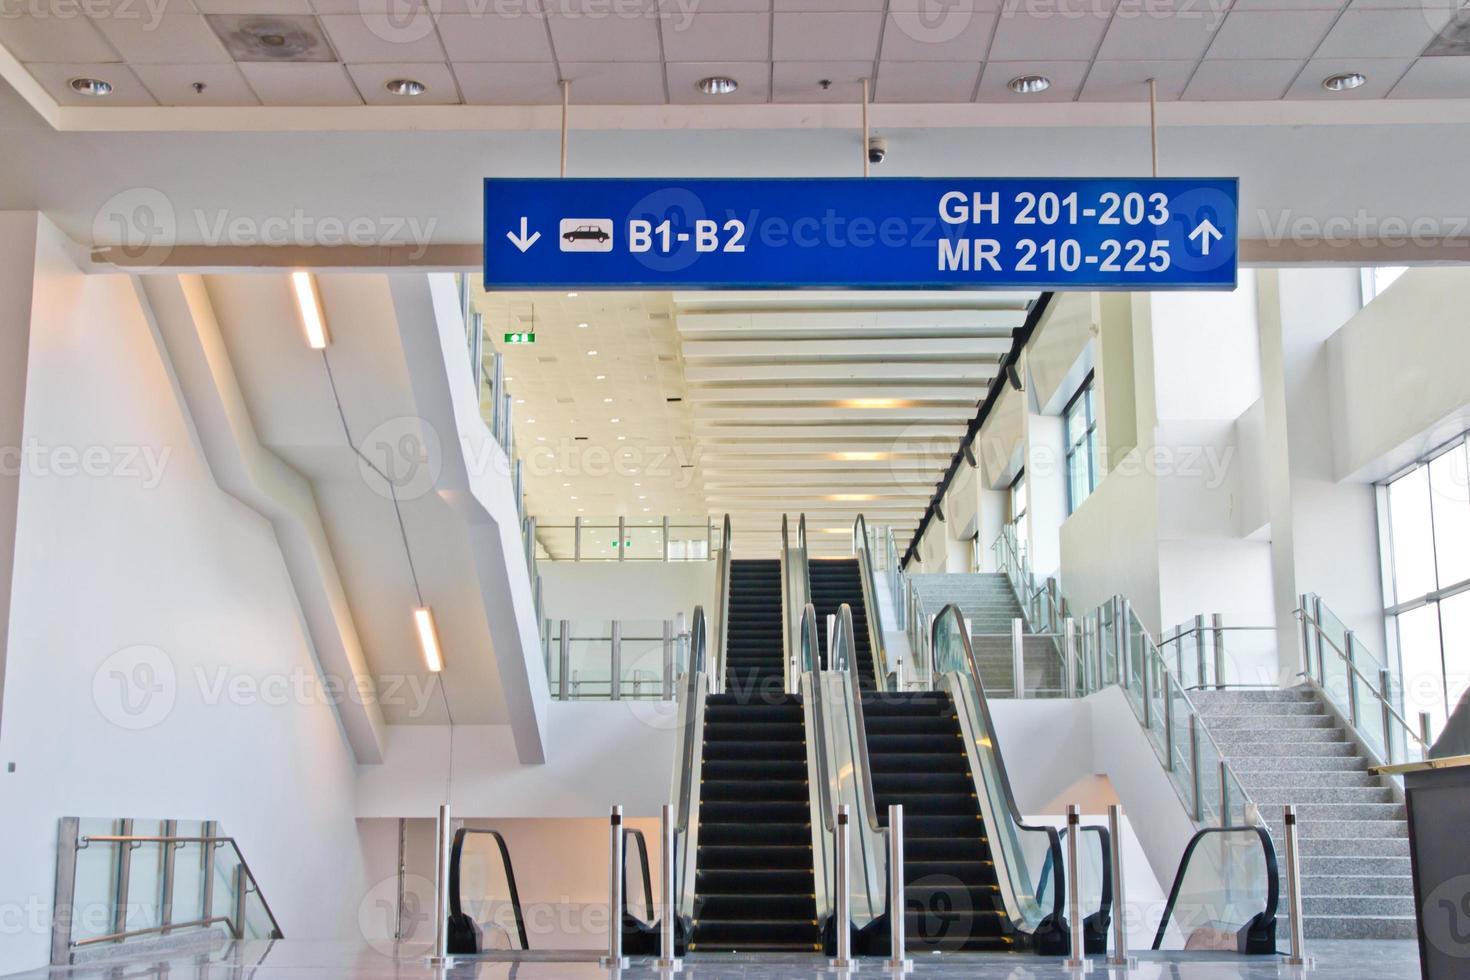 bewegende roltrap in de moderne luchthaventerminal foto